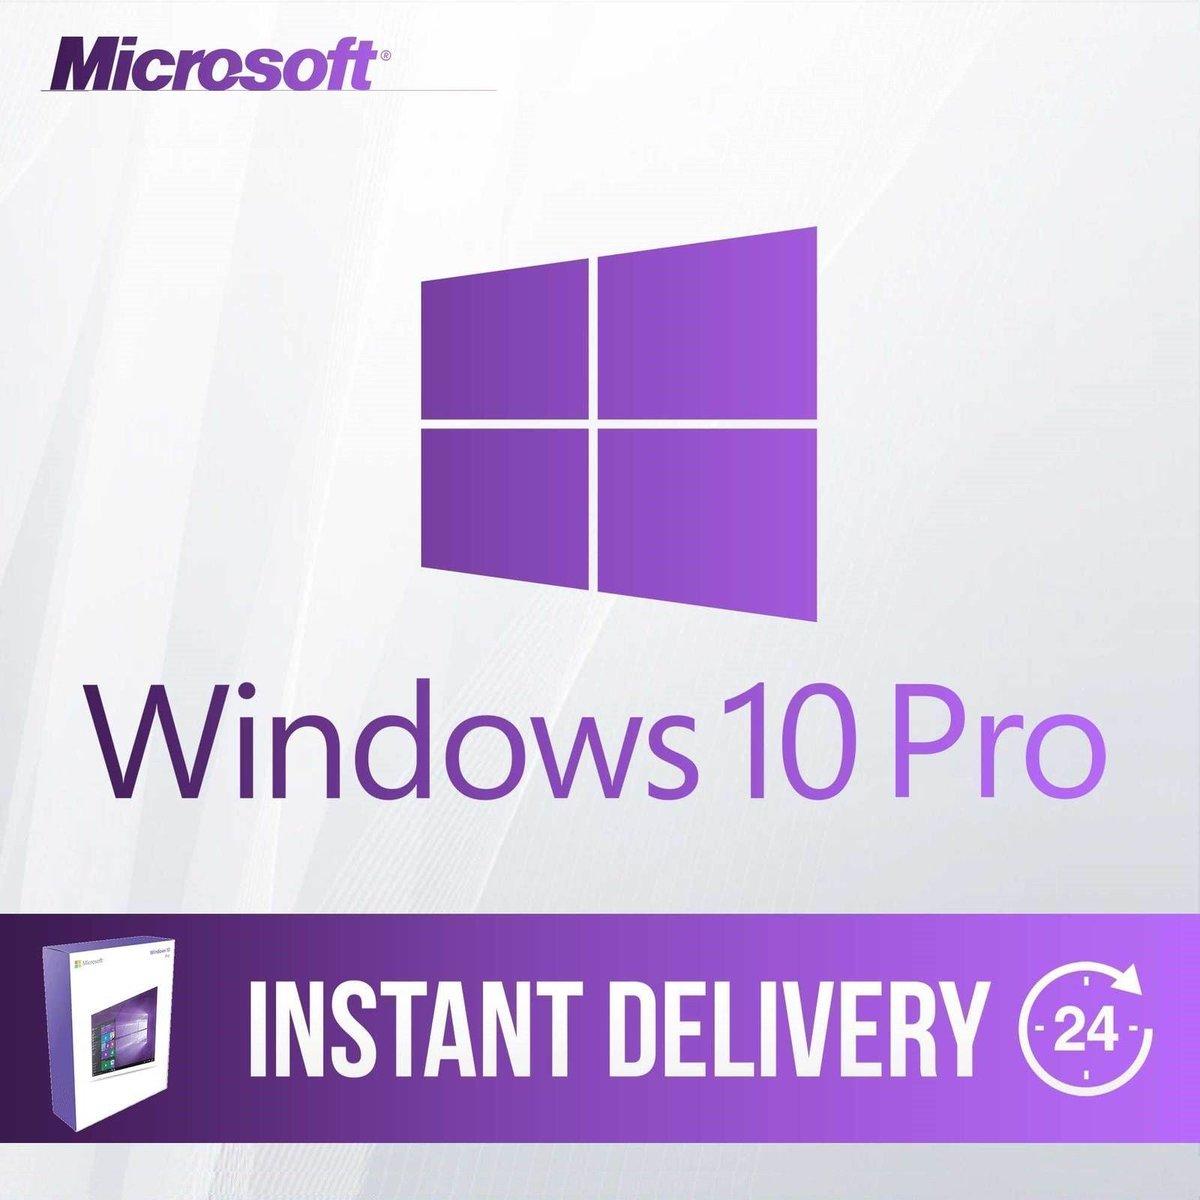 New on ebay: Windows 10 Pro Professional 32/64 Bit Product Key License Koran ESD   https://t.co/UFLMhBvPF2 https://t.co/VRieue9dut